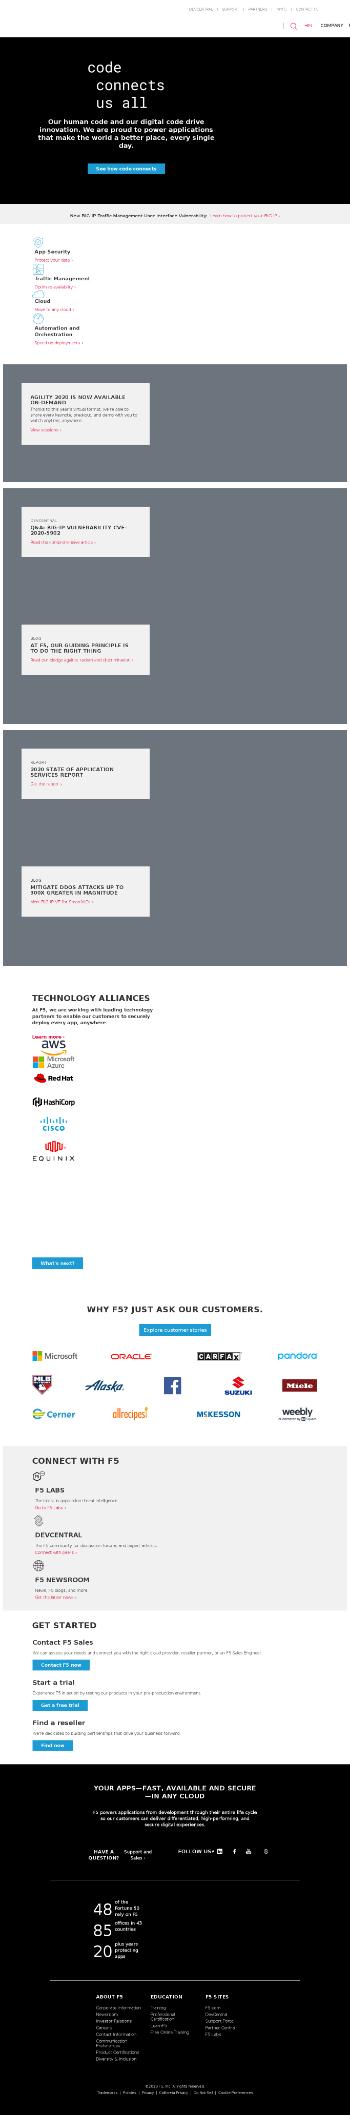 F5 Networks, Inc. Website Screenshot